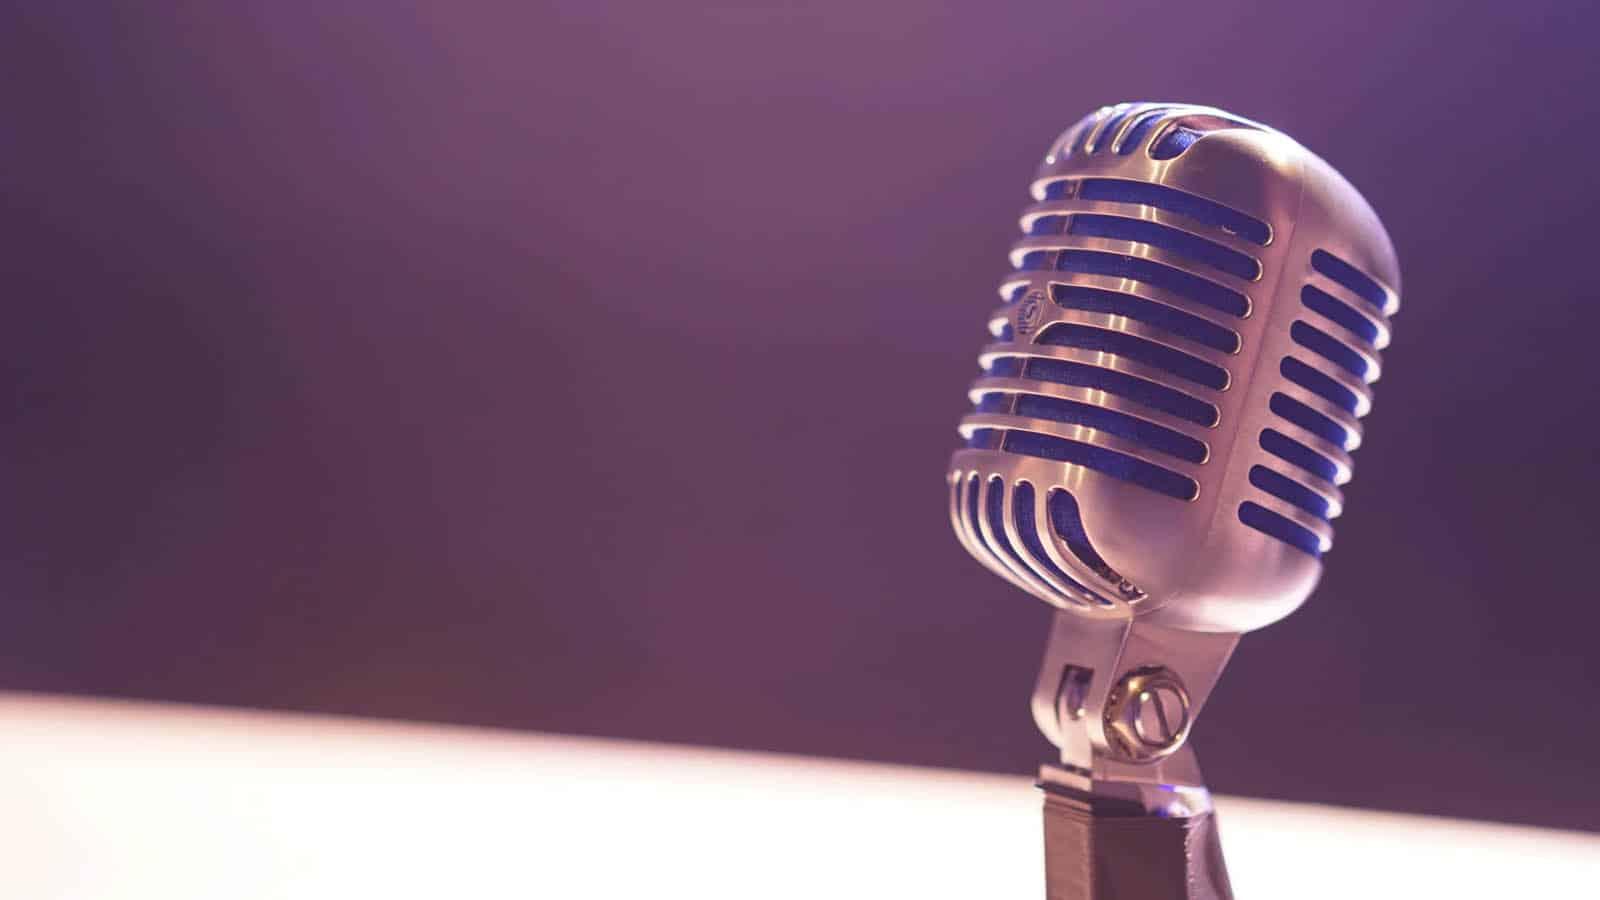 radio microphone on desk